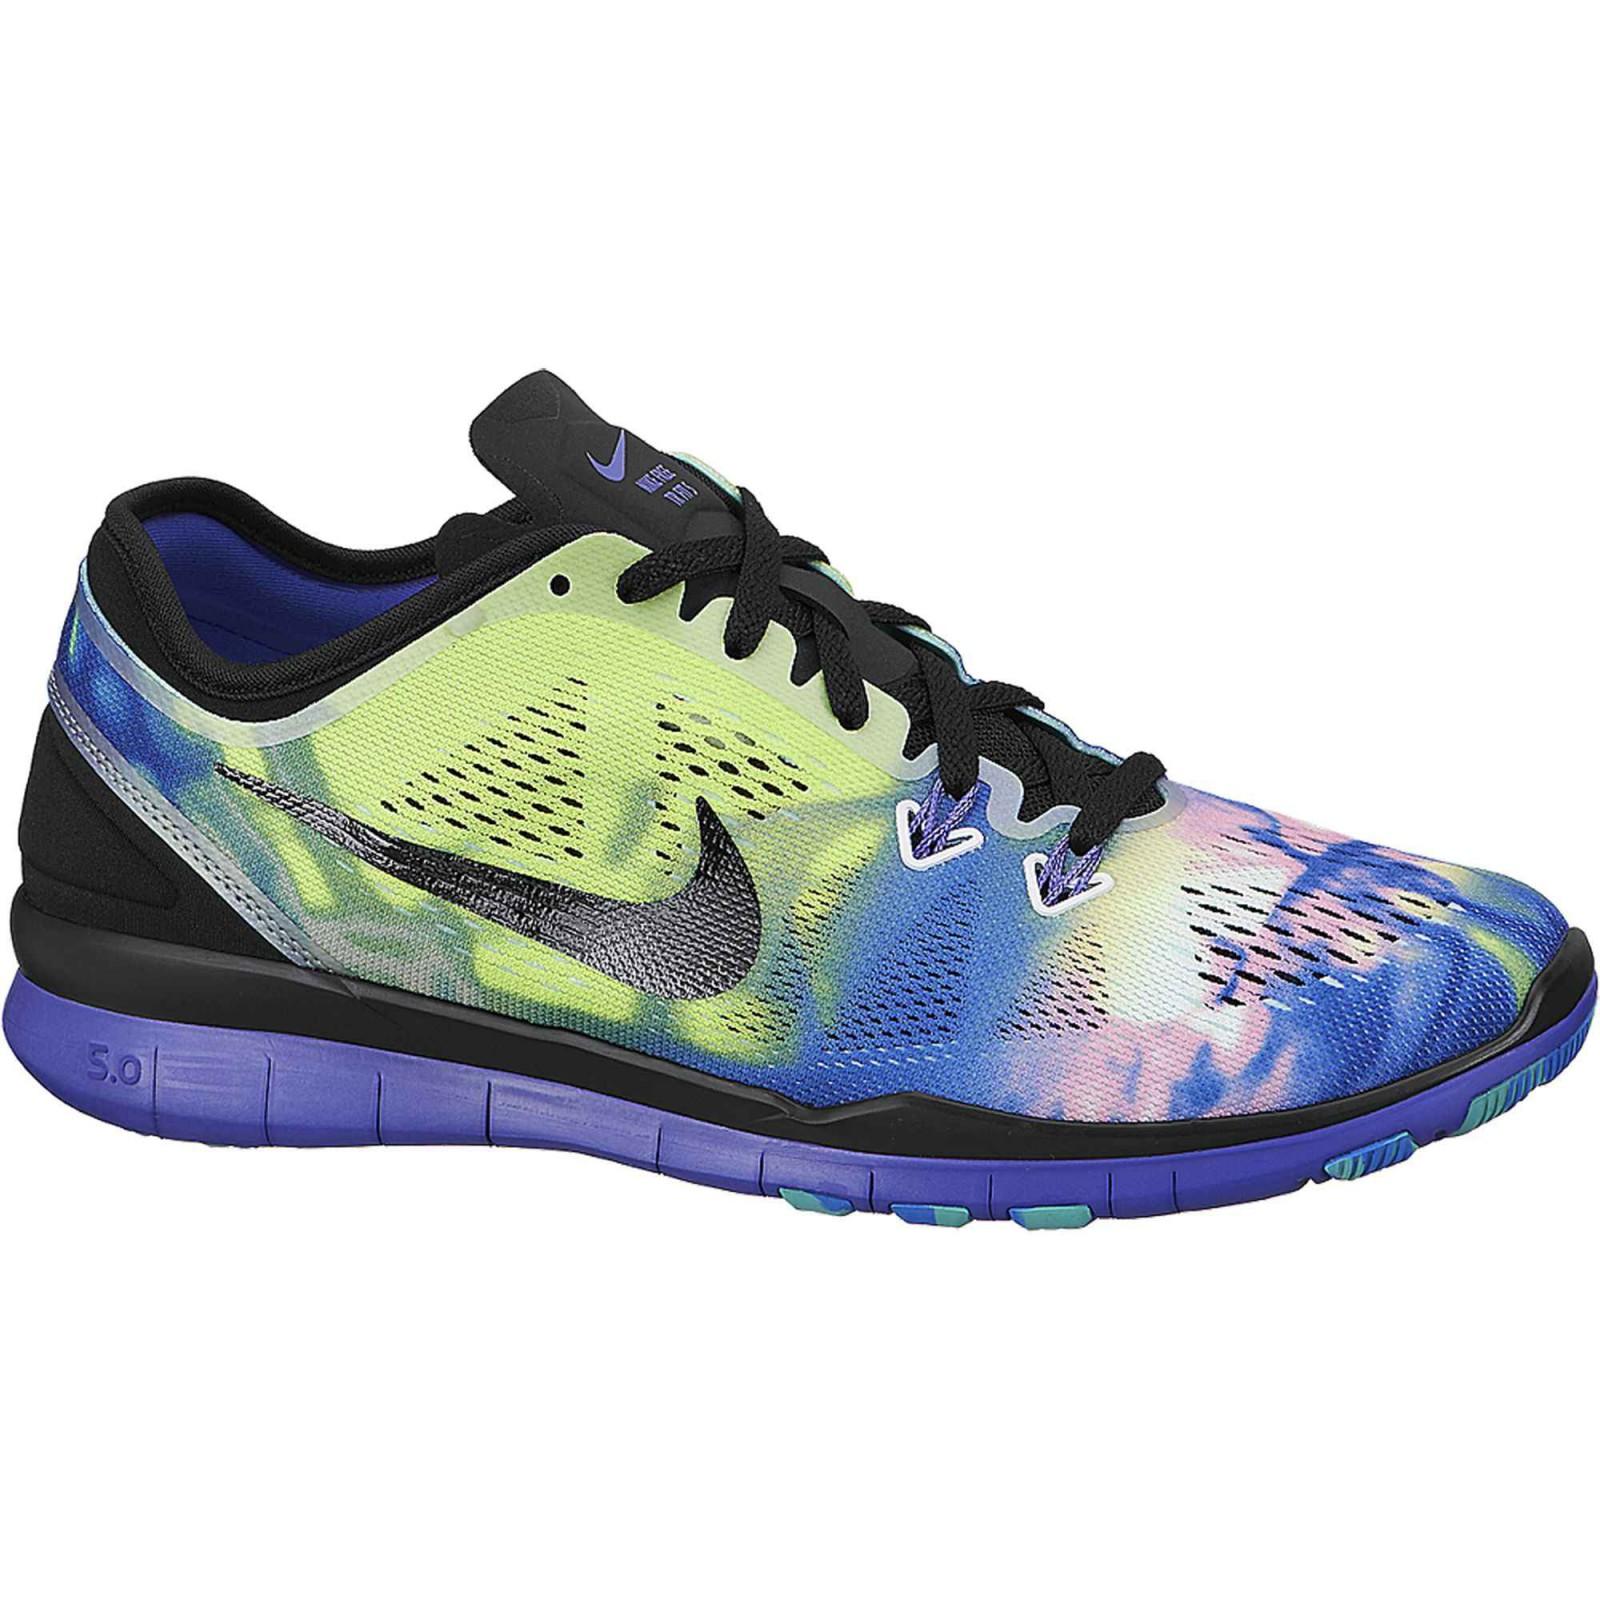 Dámská fitness obuv Nike WMNS NKE FREE 5.0 TR FIT 5 PRT  7b29c424b8